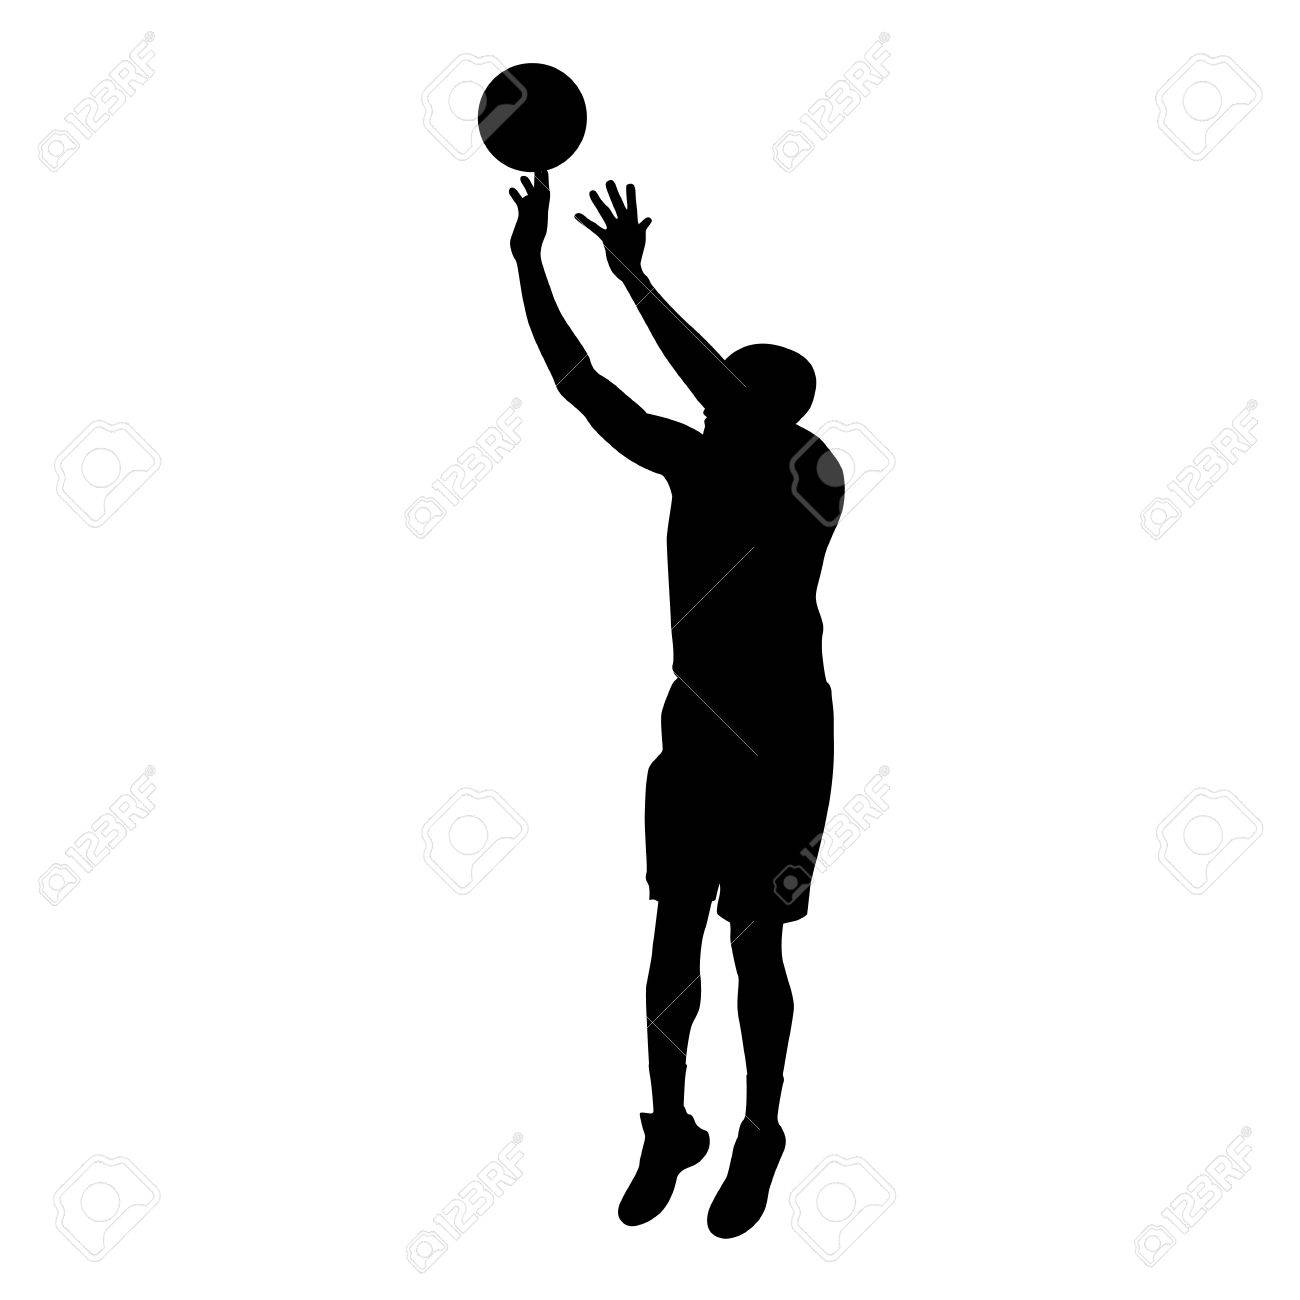 Basketball player makes jump shot, vector silhouette.